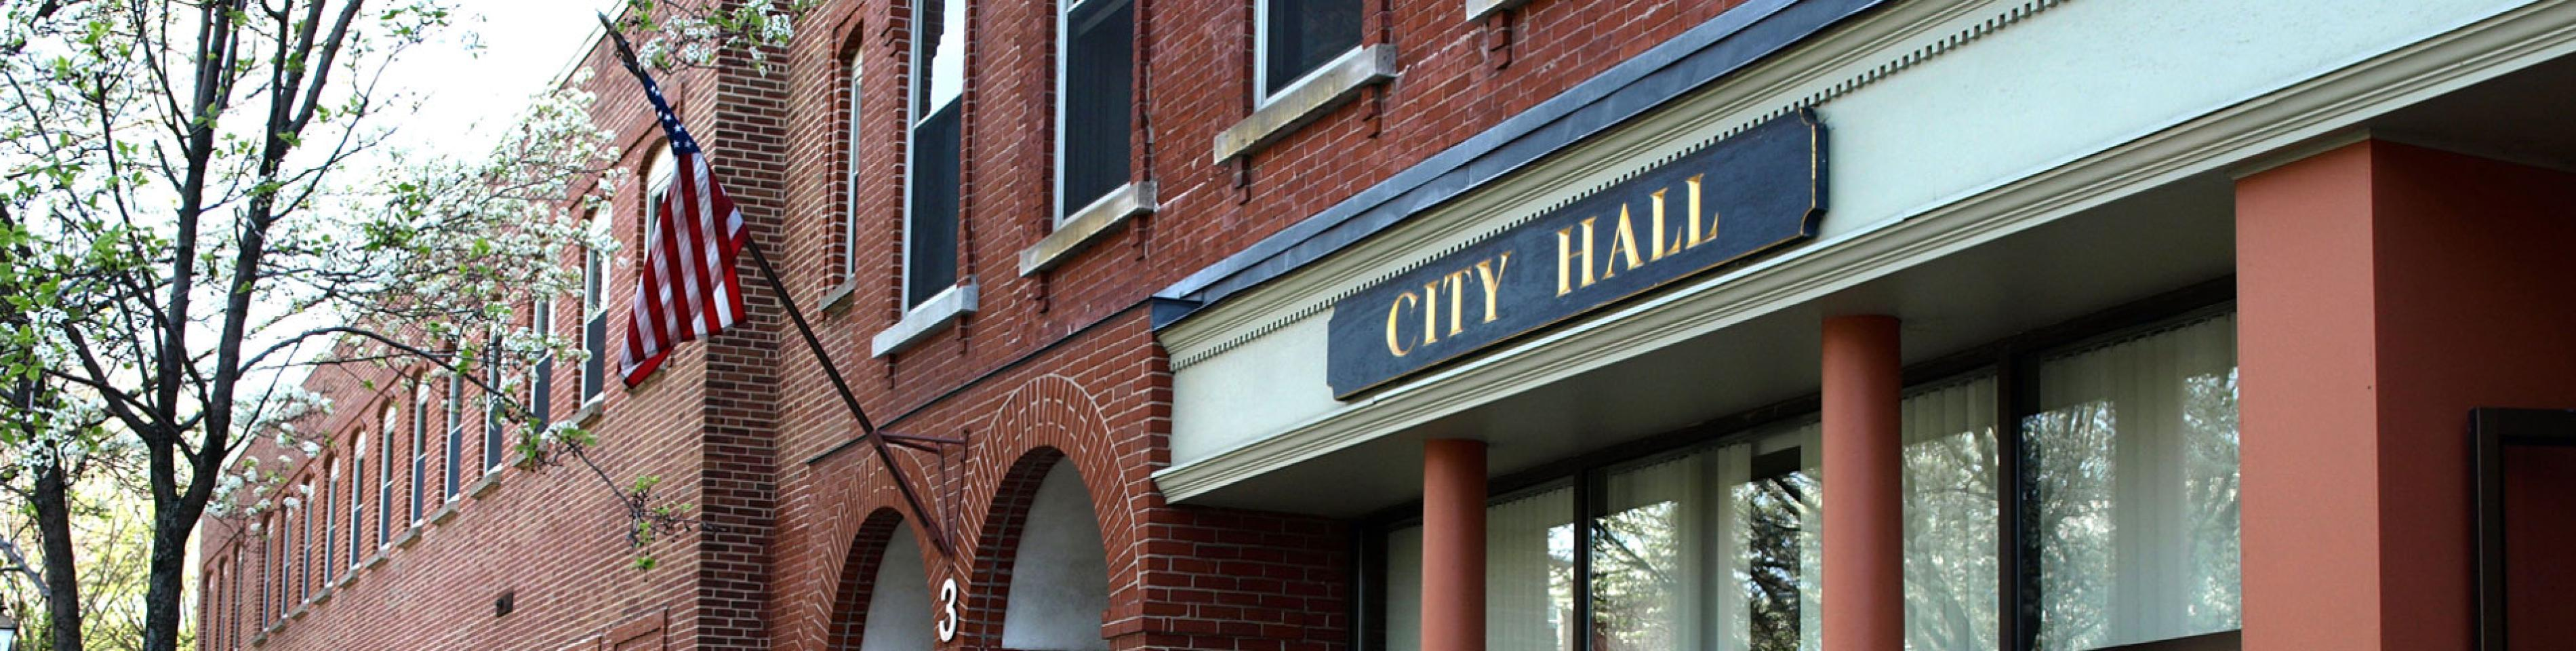 keene city hall